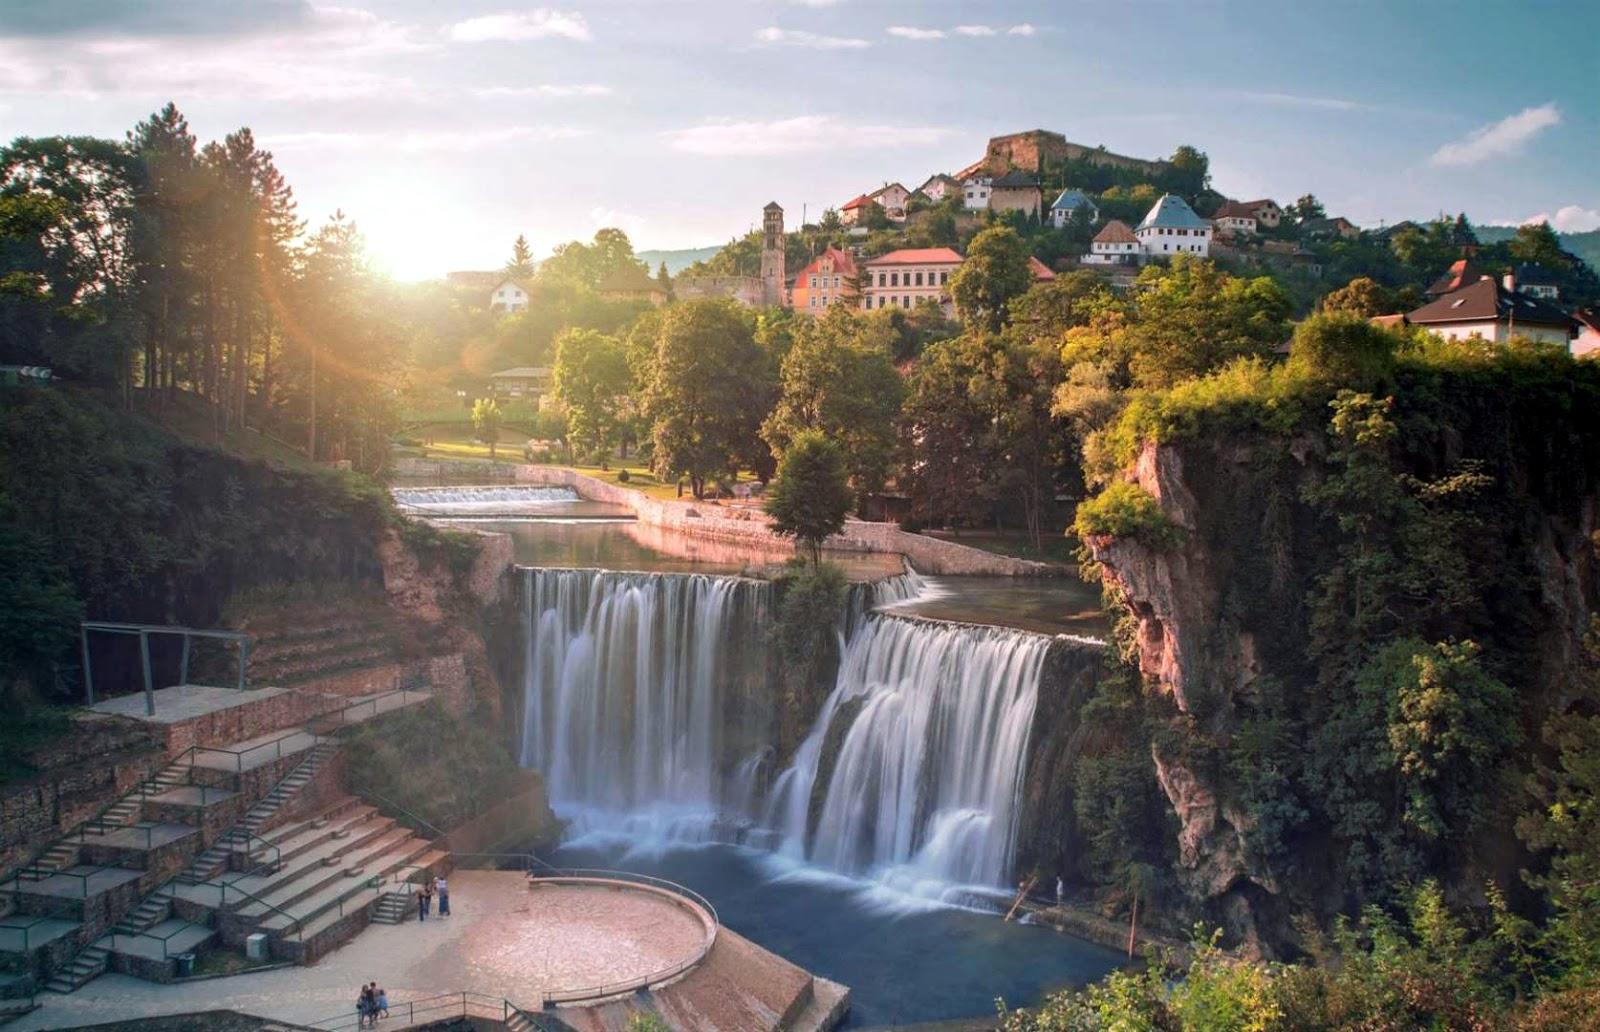 Pliva Waterfall - Waterfall in Bosnia and Herzegovina